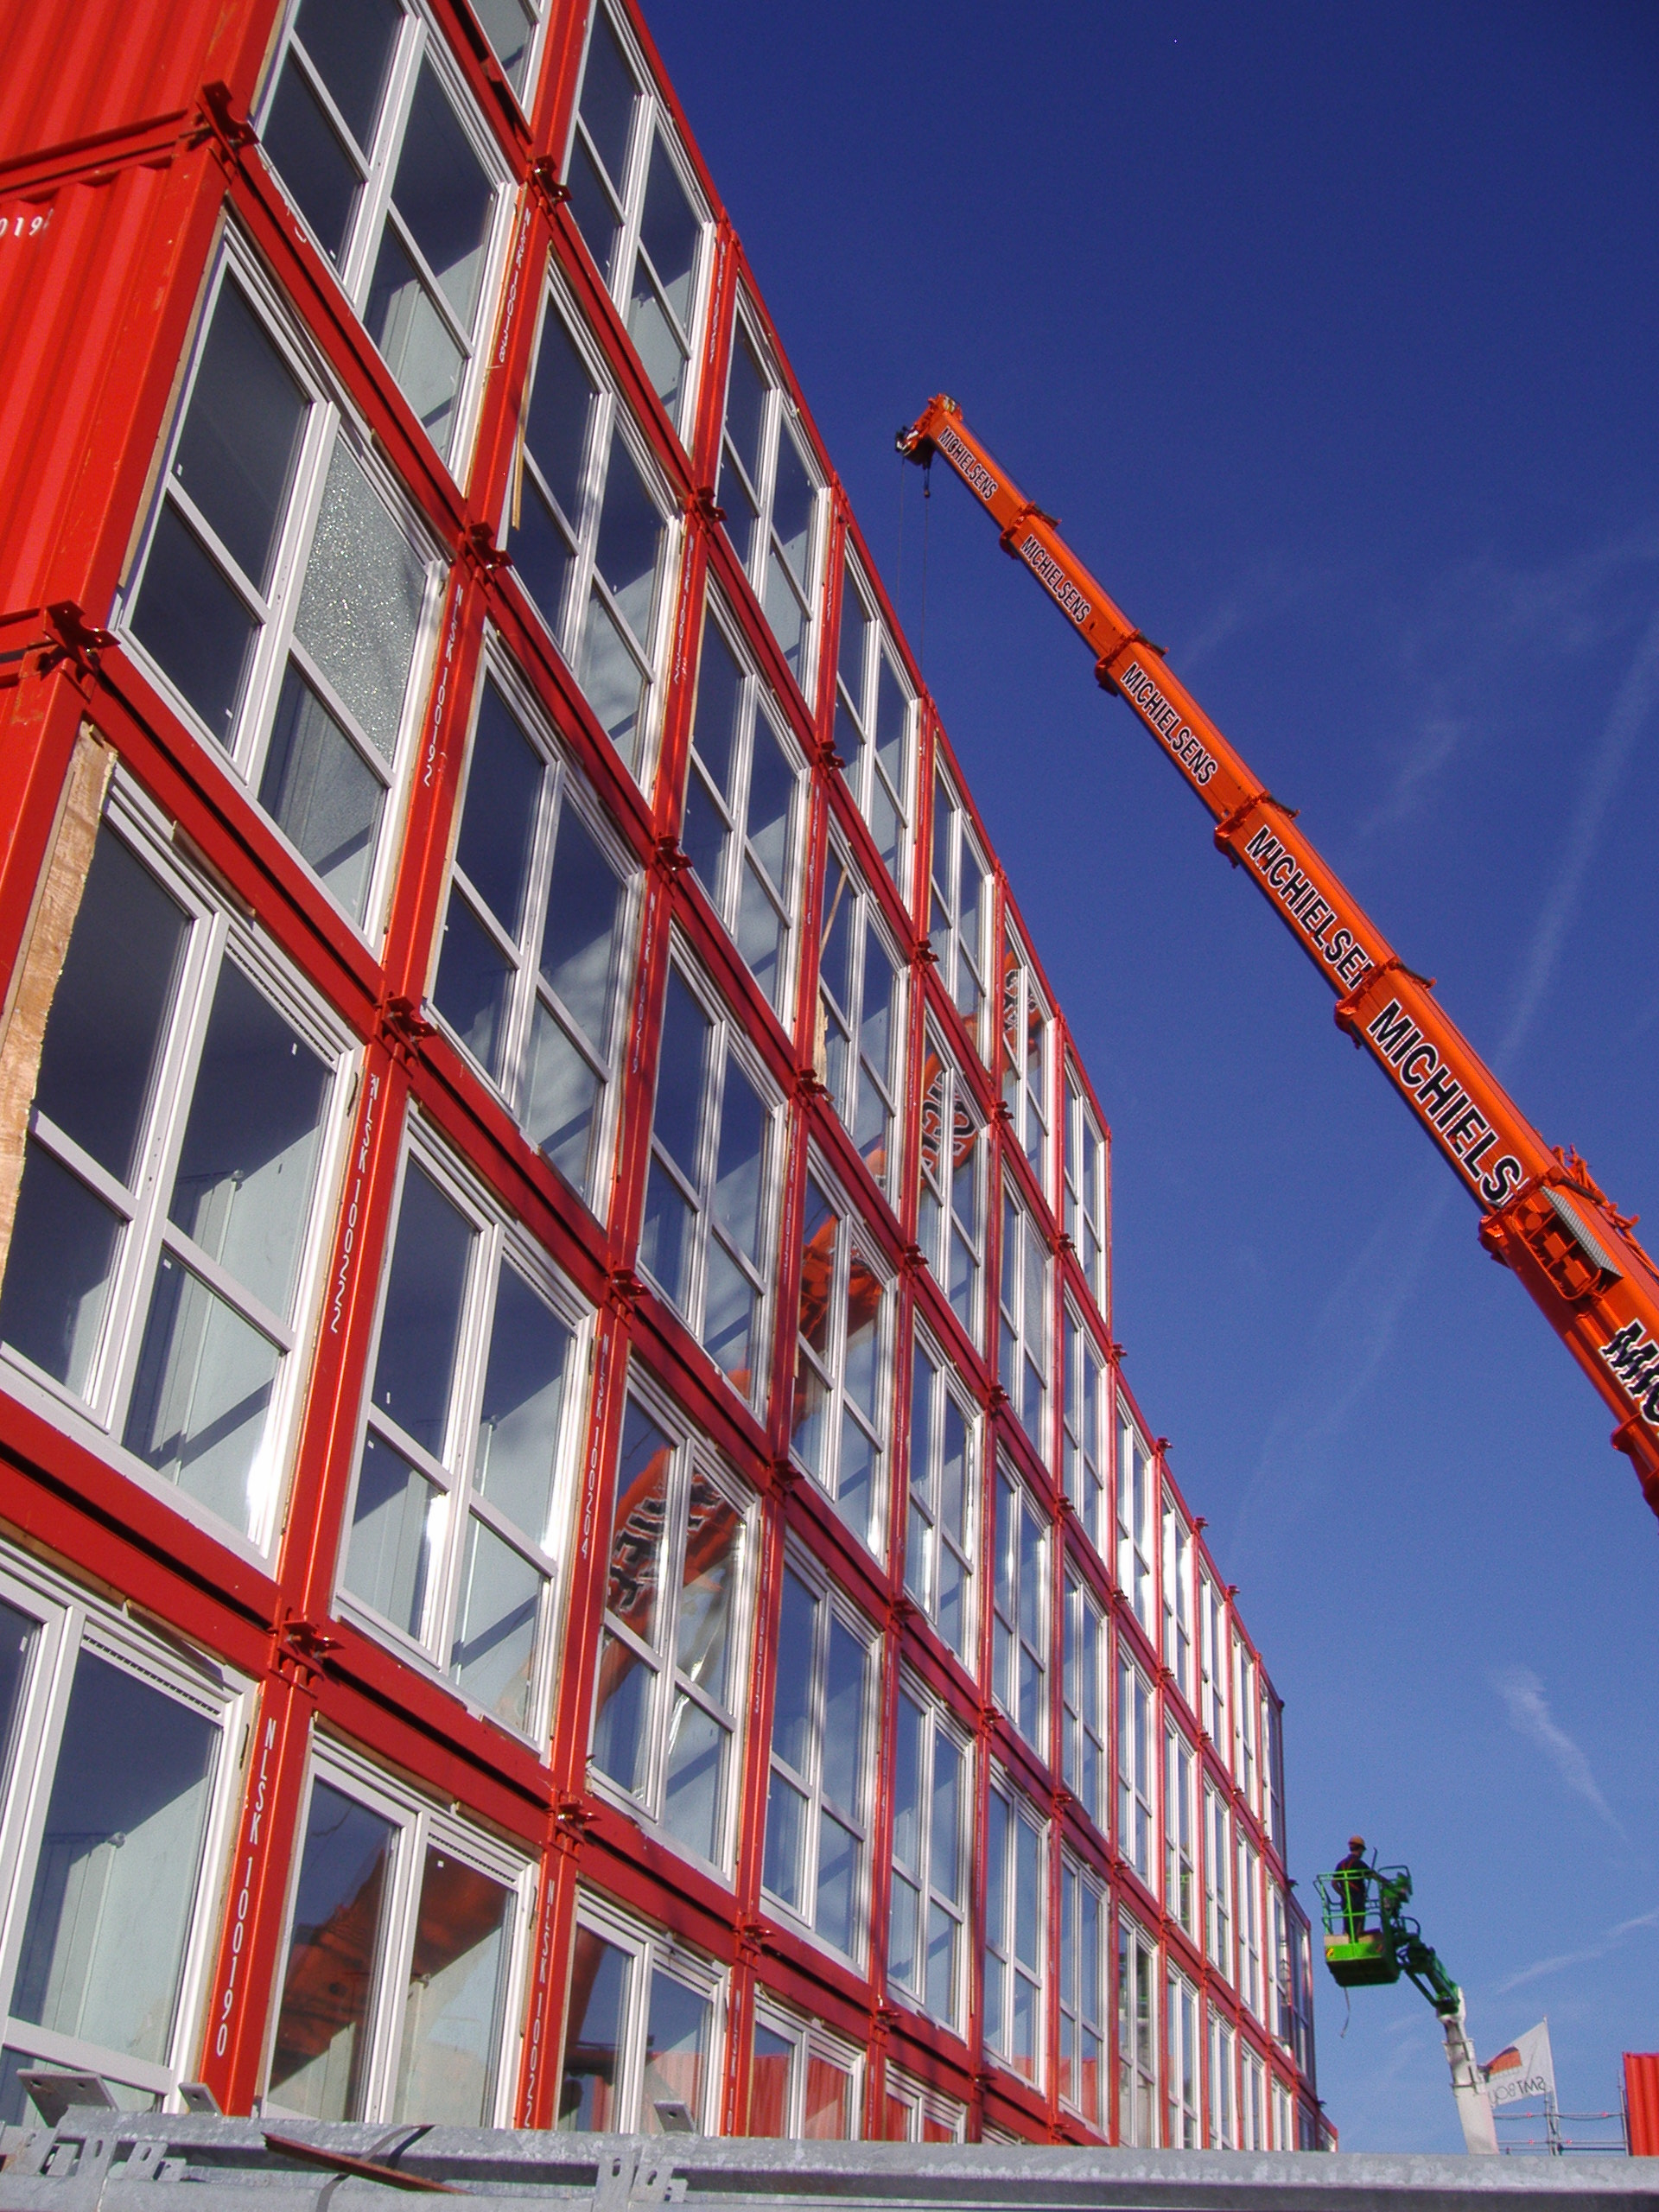 inspiring the world of modular building